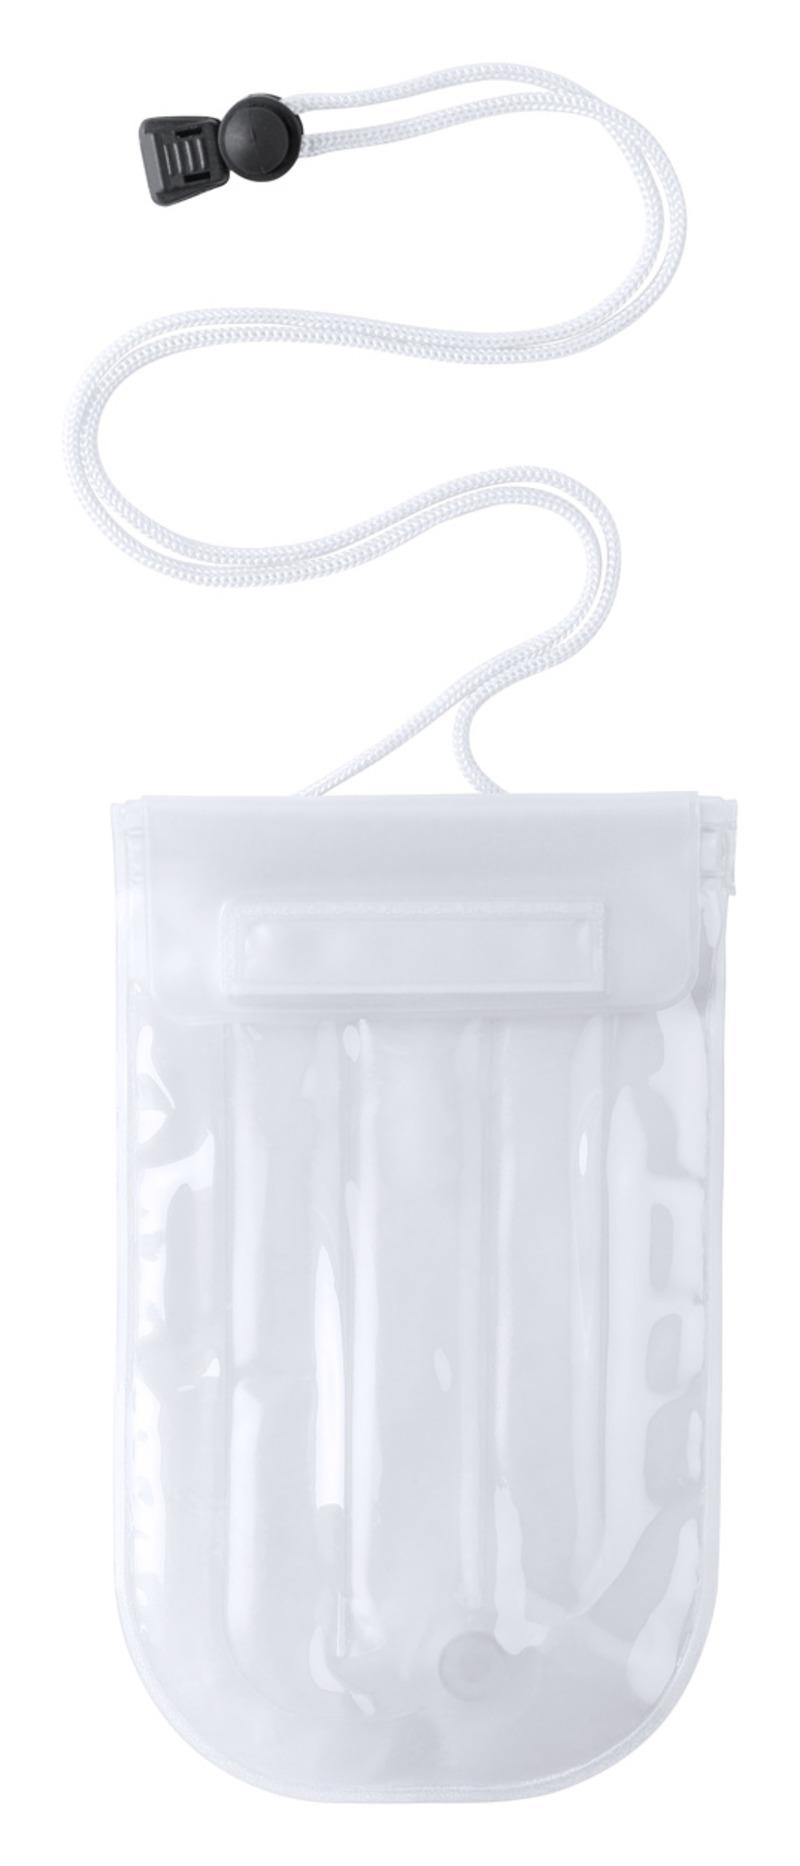 Flextar waterproof mobile case